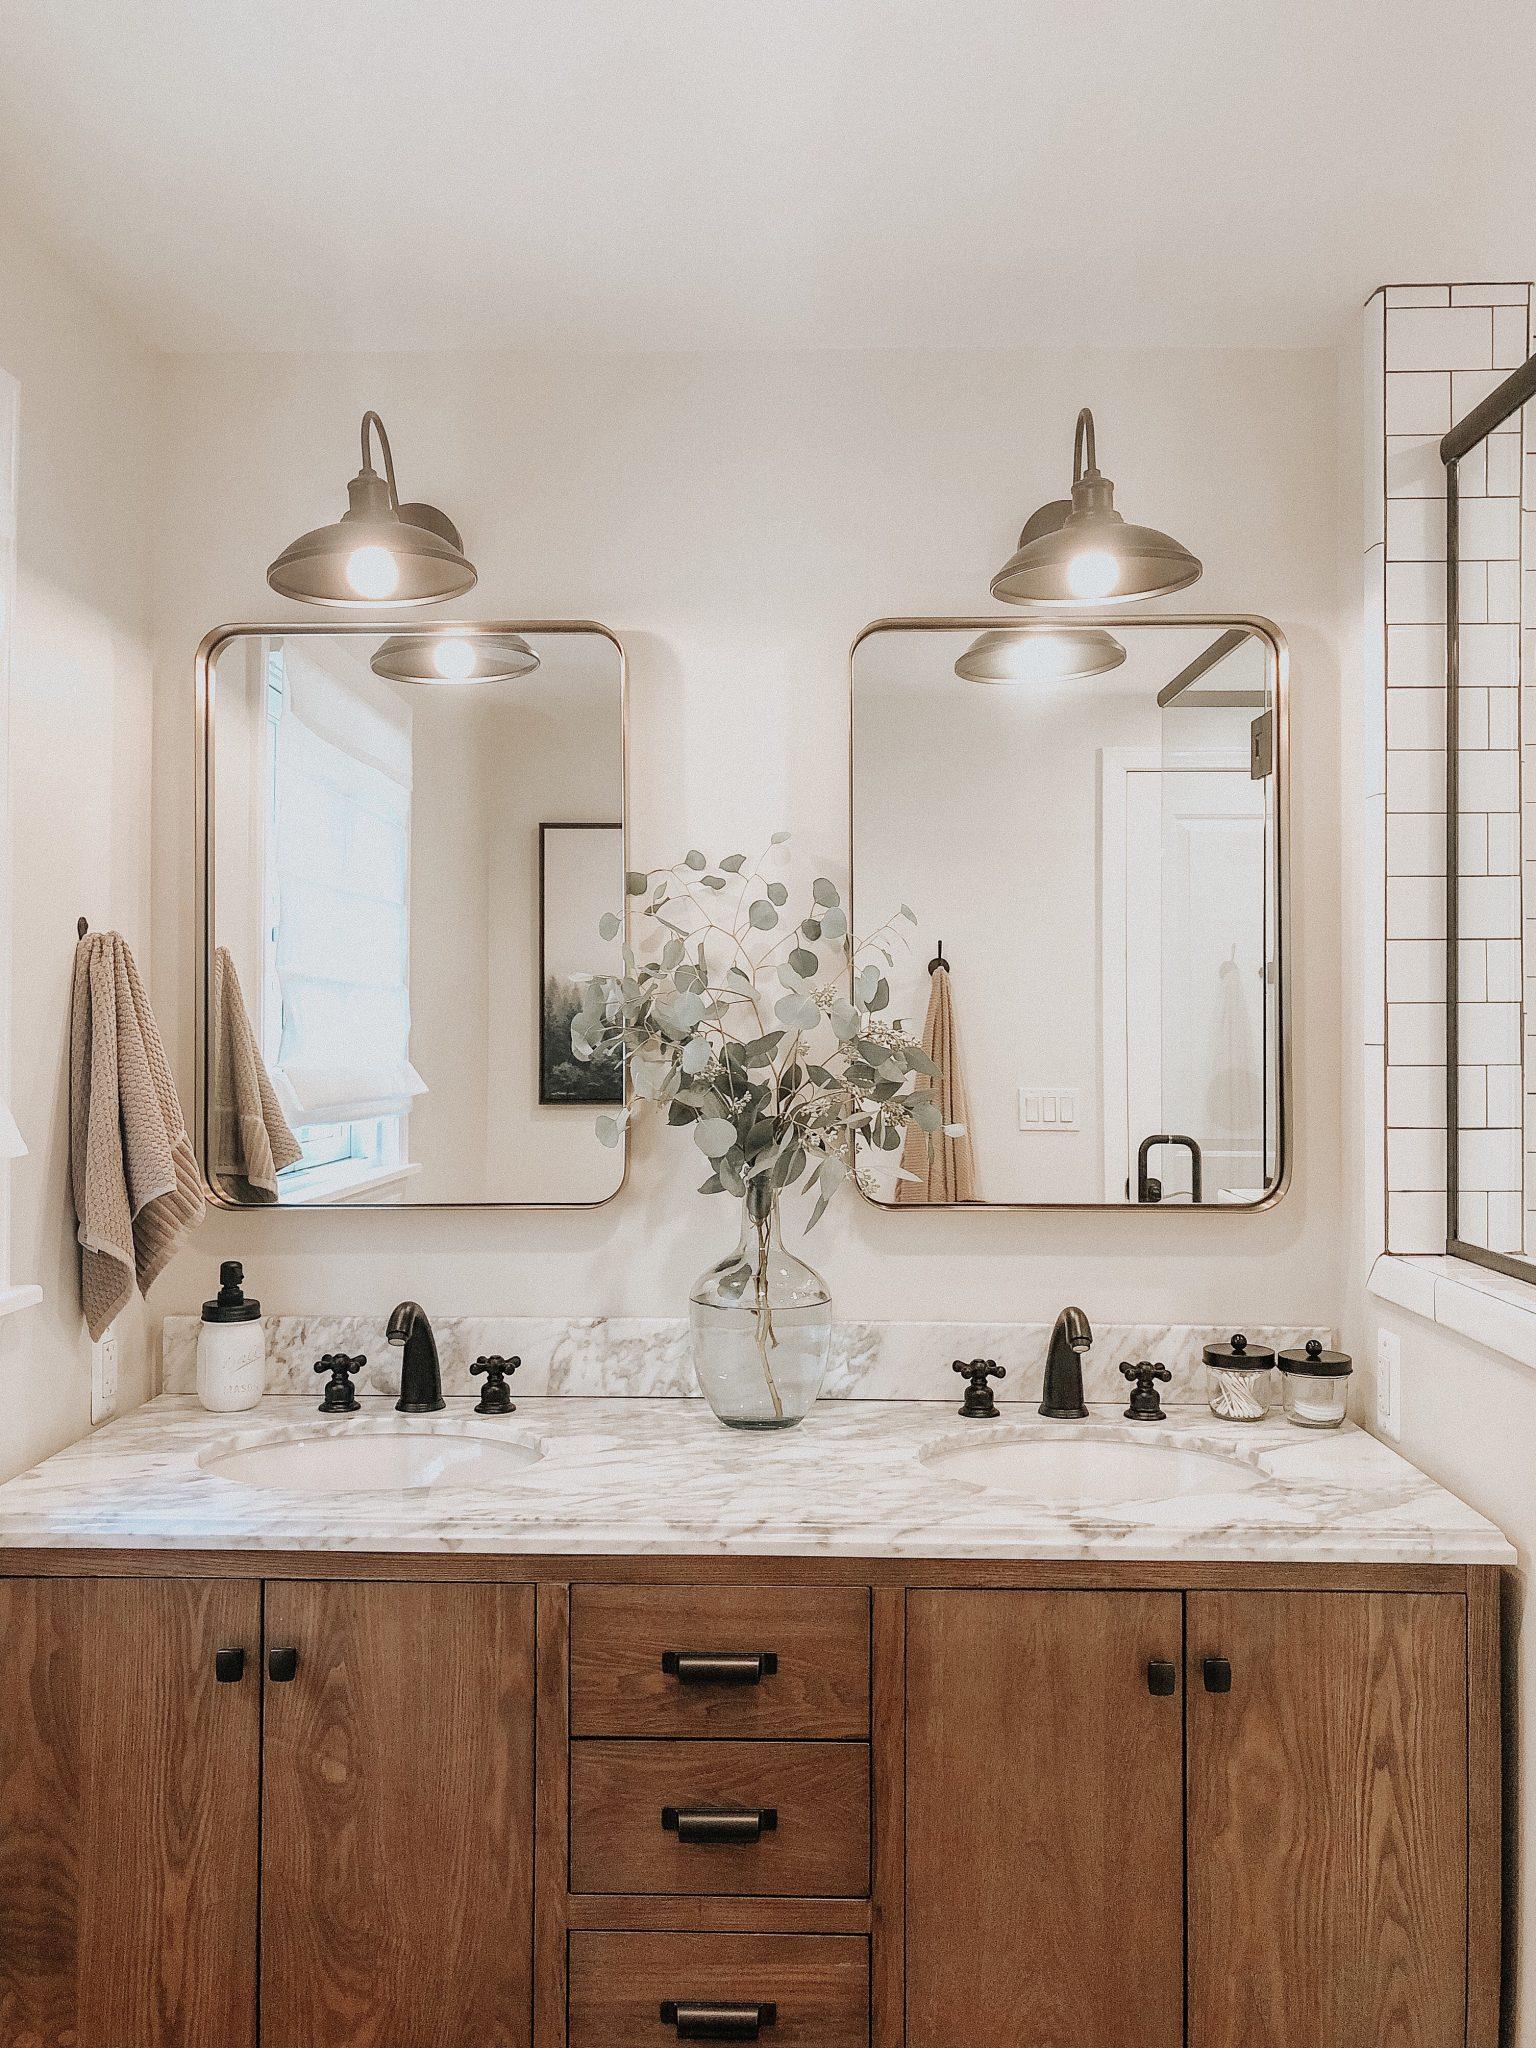 Master Bathroom Reveal | Daily Splendor Life and Style Blog | master bathroom #modernfarmhouse #modernfarmhousebathroom #Fixerupperstyle #contemporarybathroom #marbletile #subwaytile #subwaytileshower #herringbonetilefloor #matteblackbathroomfixtures #bathroomvanity #woodvanity